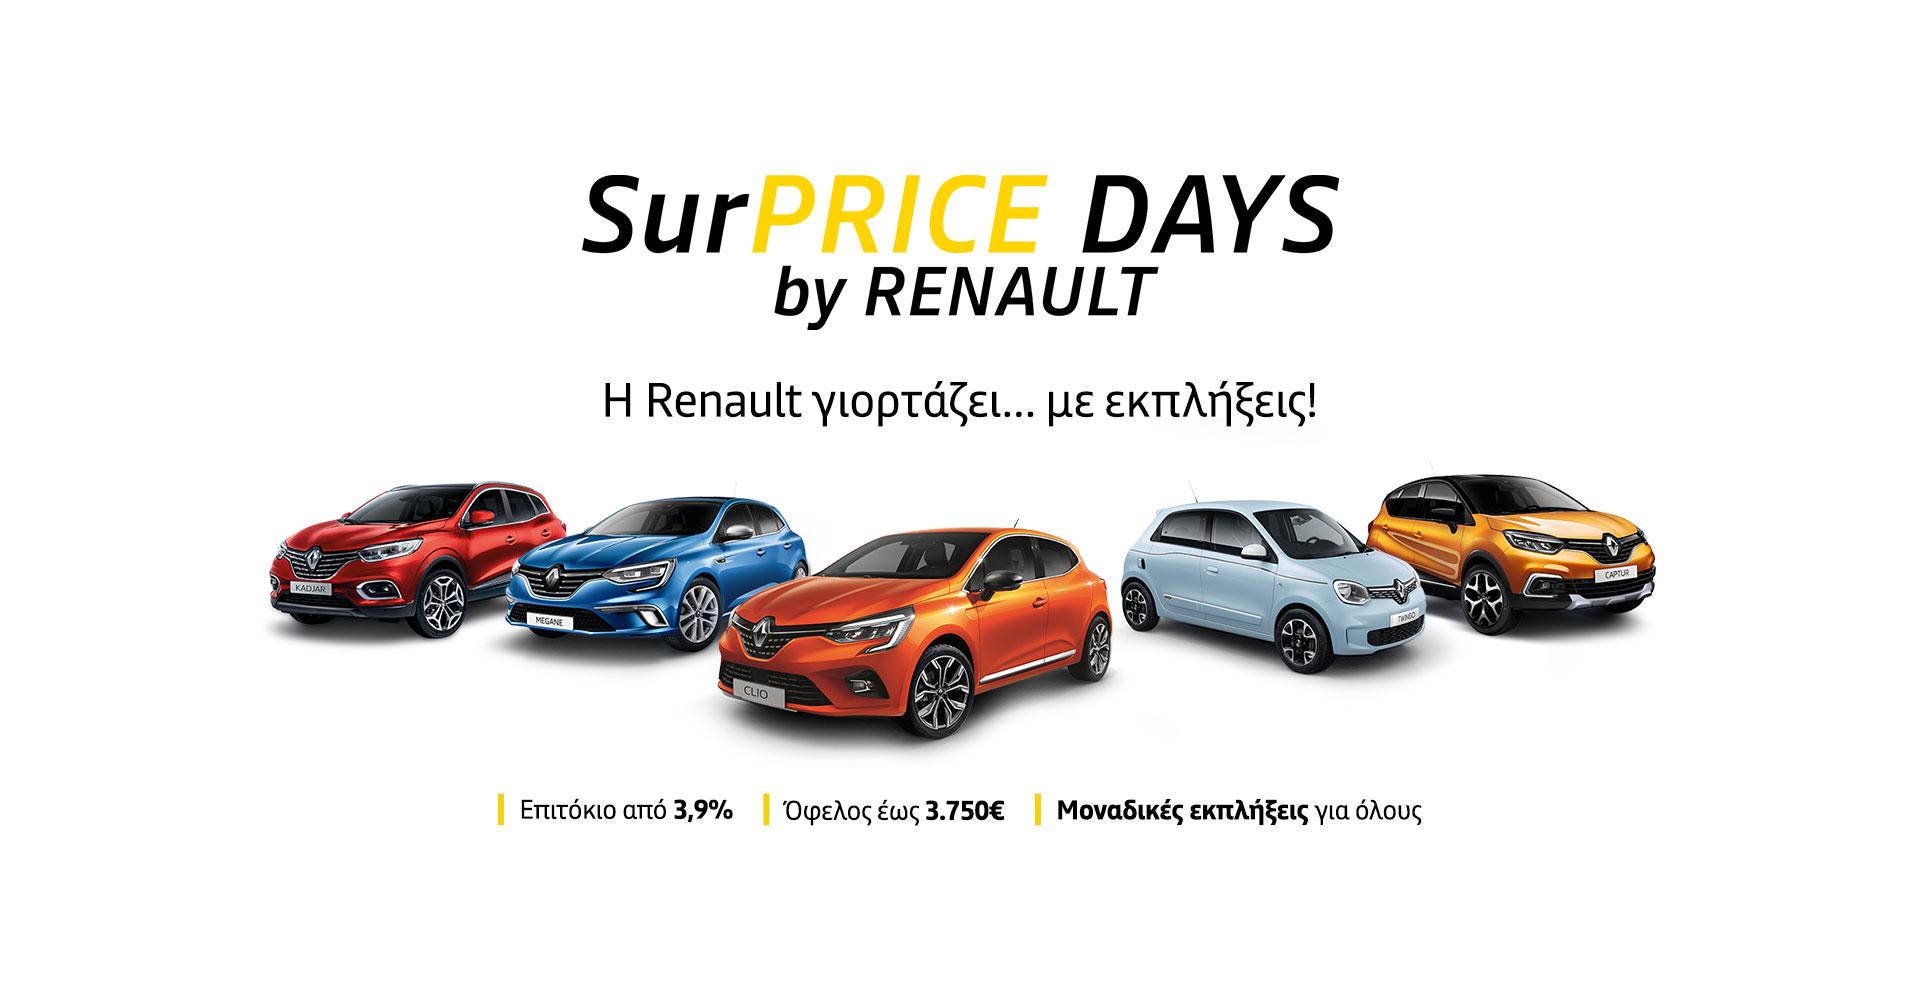 SurPrize Days Renault Automotivo